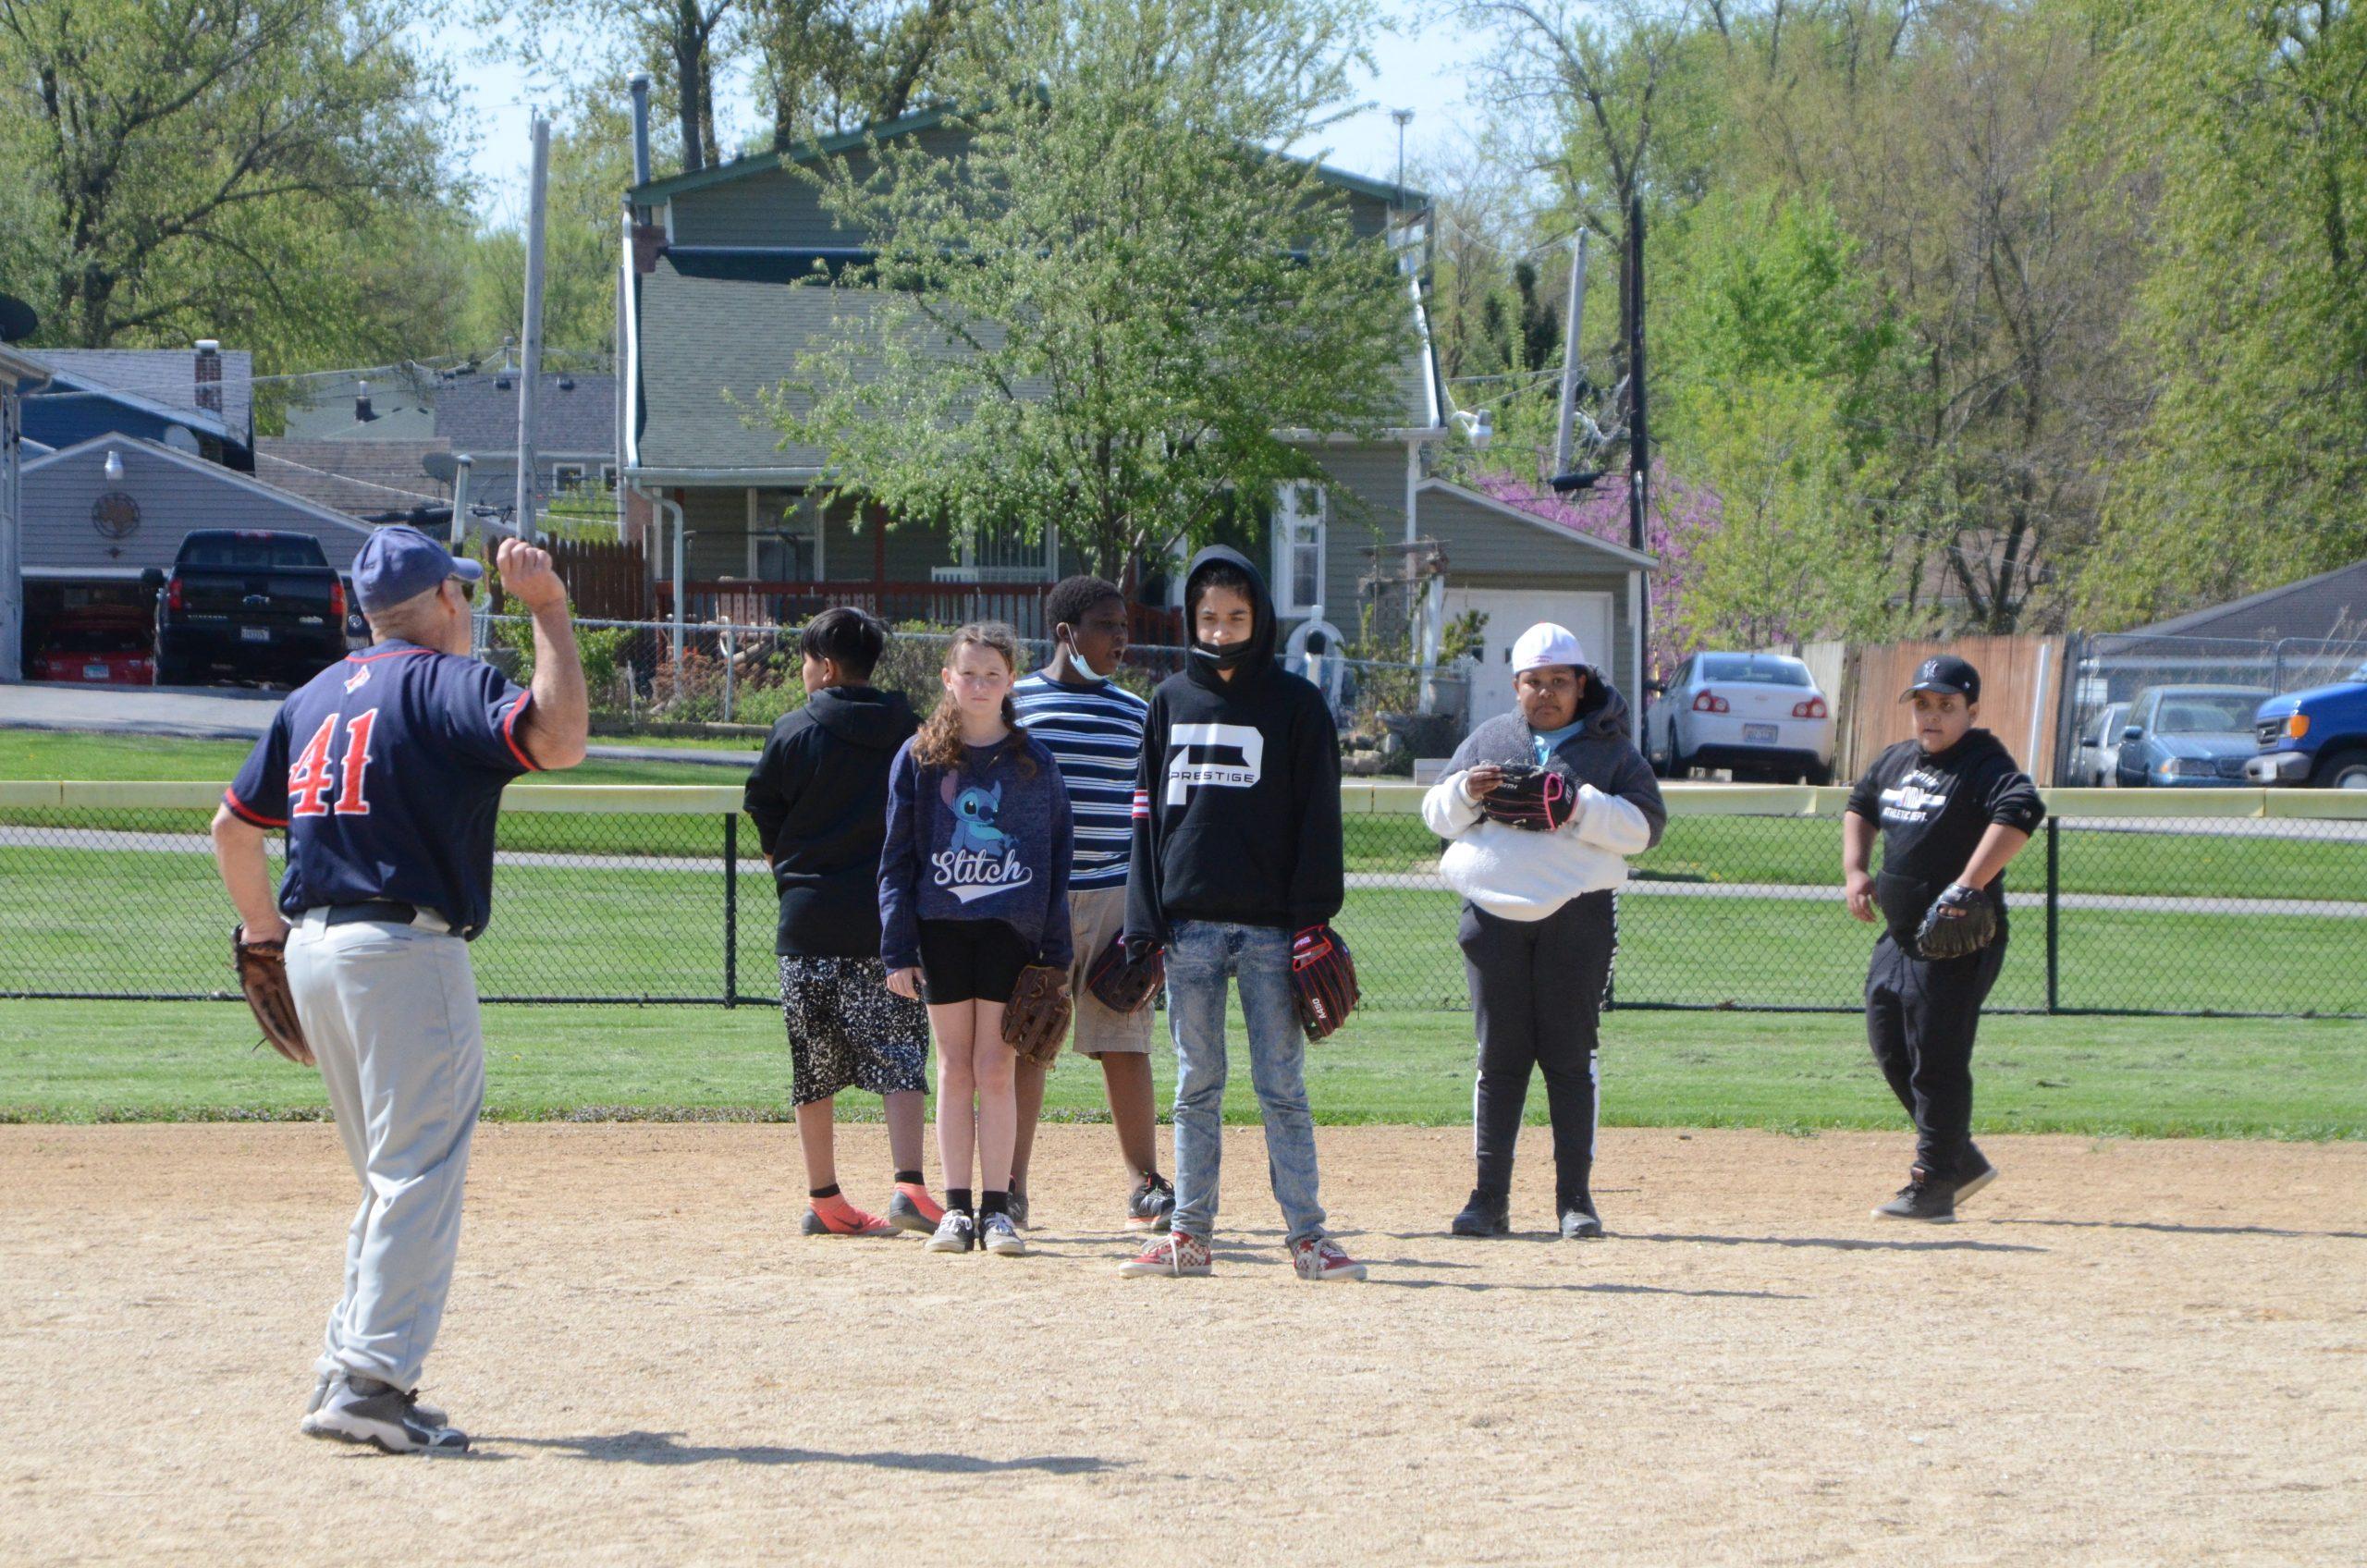 Baseball instruction